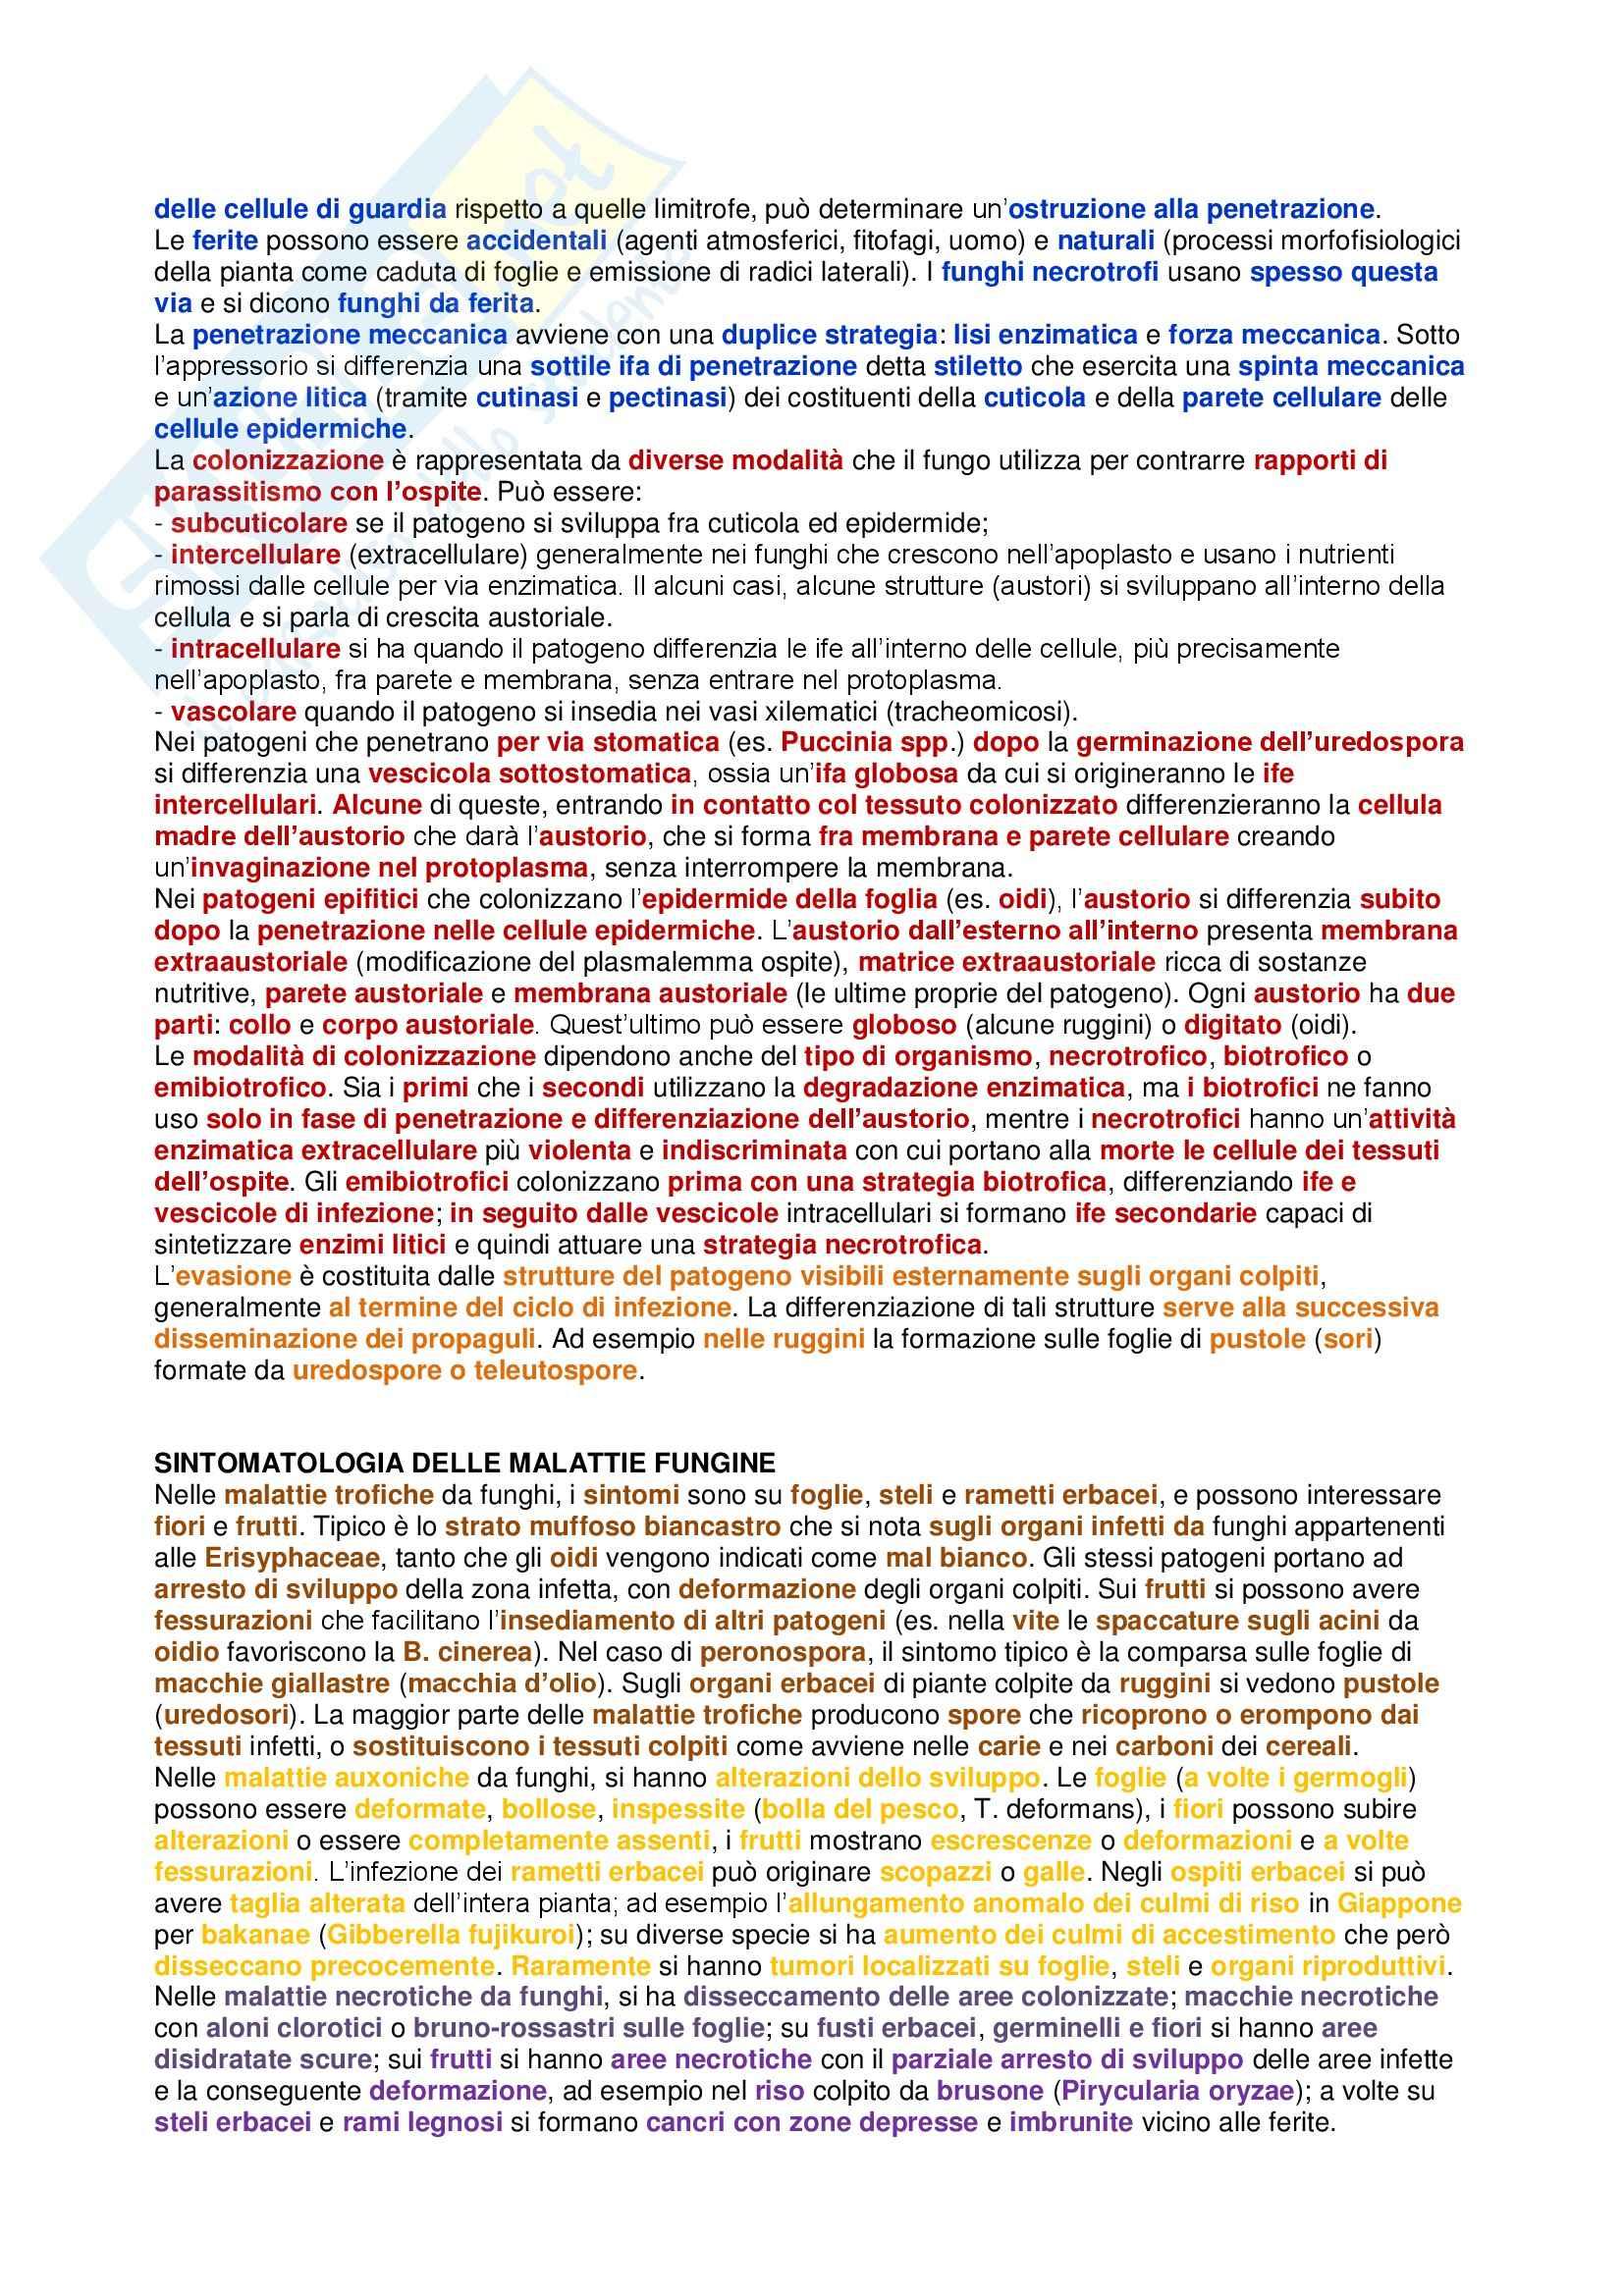 Riassunto esame Patologia Vegetale Generale, prof. Pollastro Pag. 16